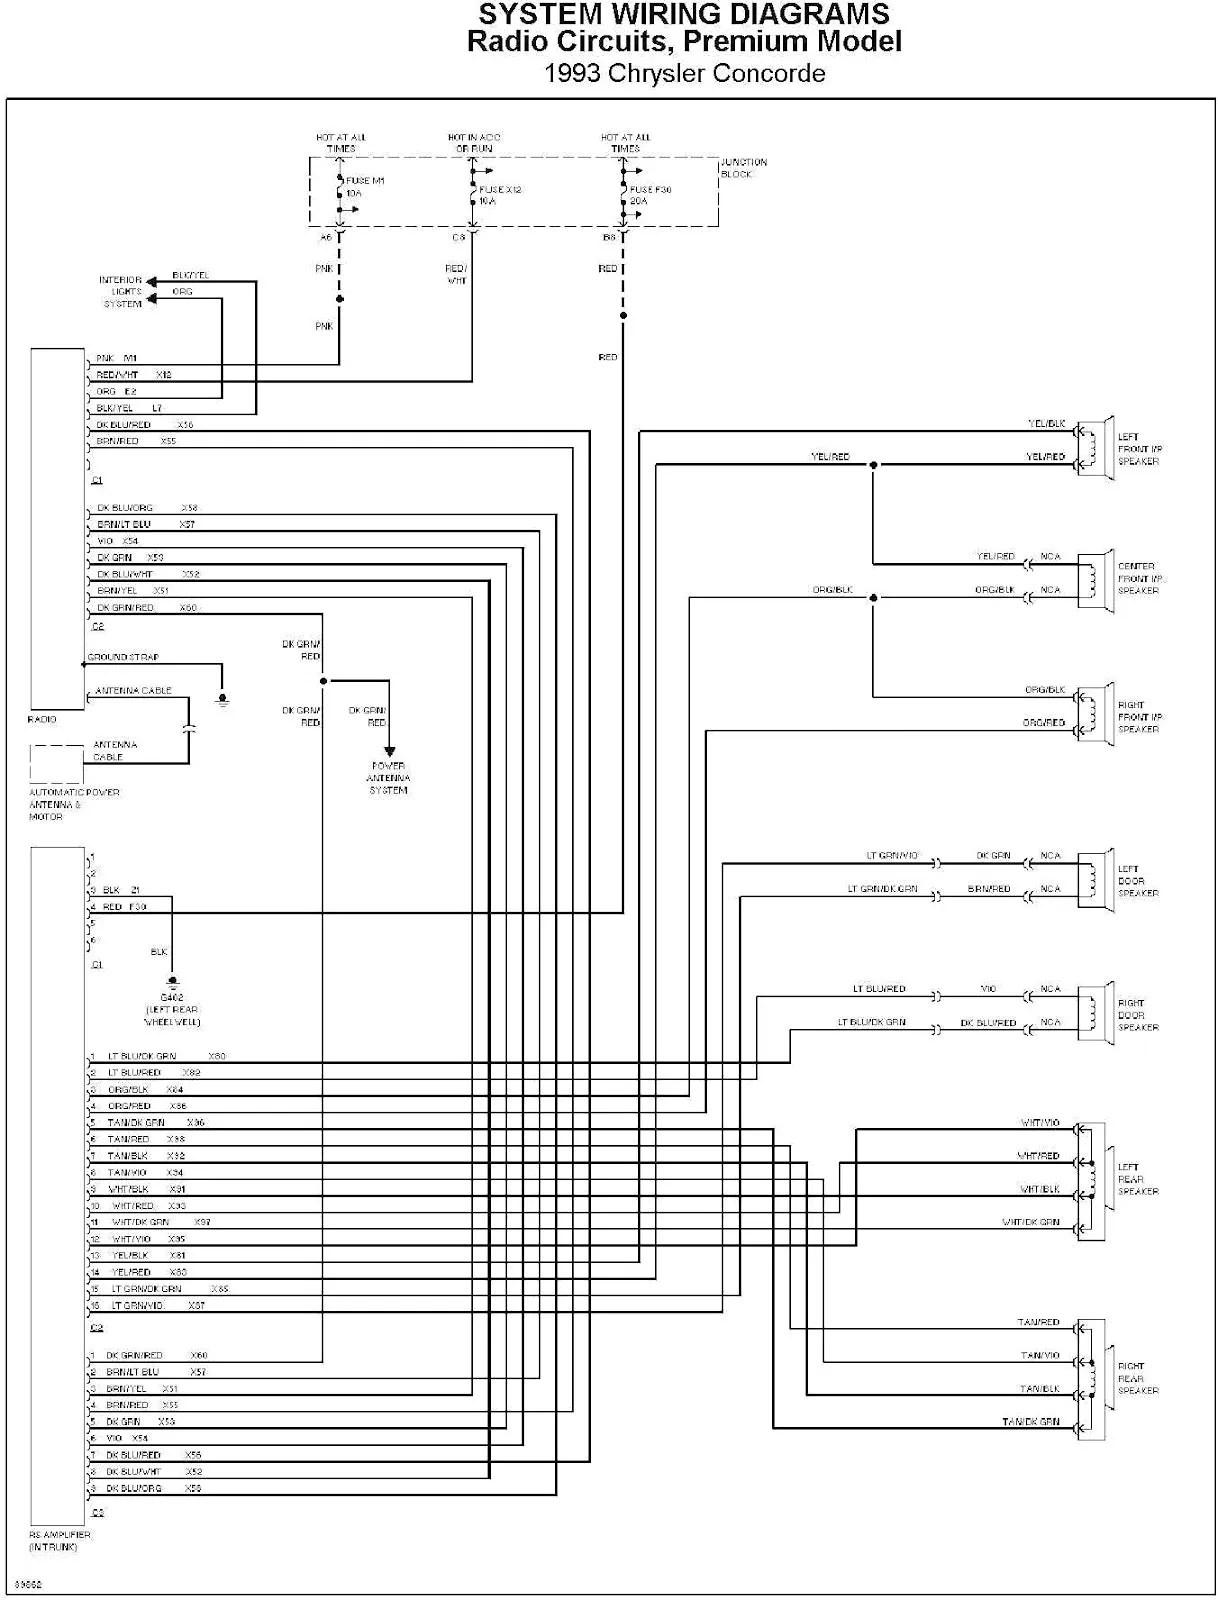 hight resolution of 2007 chrysler 300 engine diagram harley davidson radio wiring diagram for 0900c bba2 gif bright of